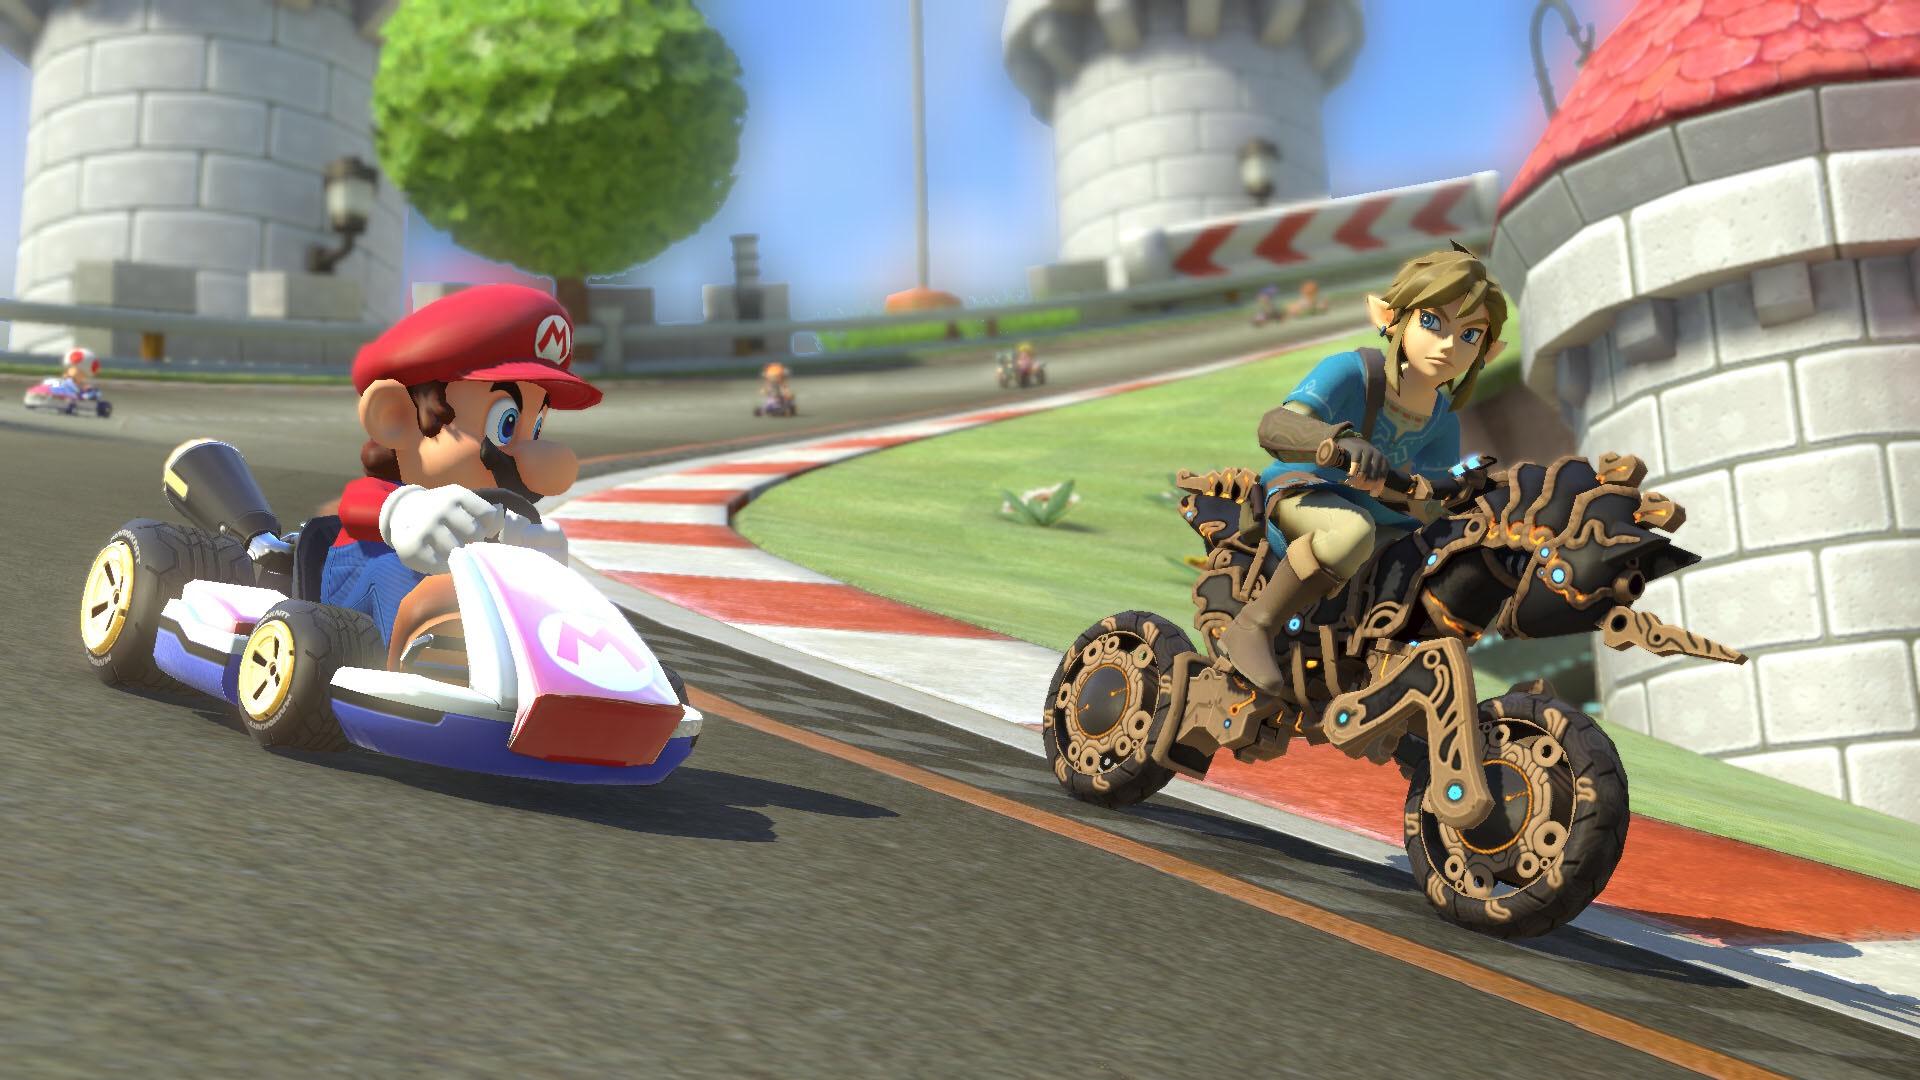 Free Mario Kart 8 Deluxe DLC (Nintendo Switch): BOTW Link plus BOTW kart items